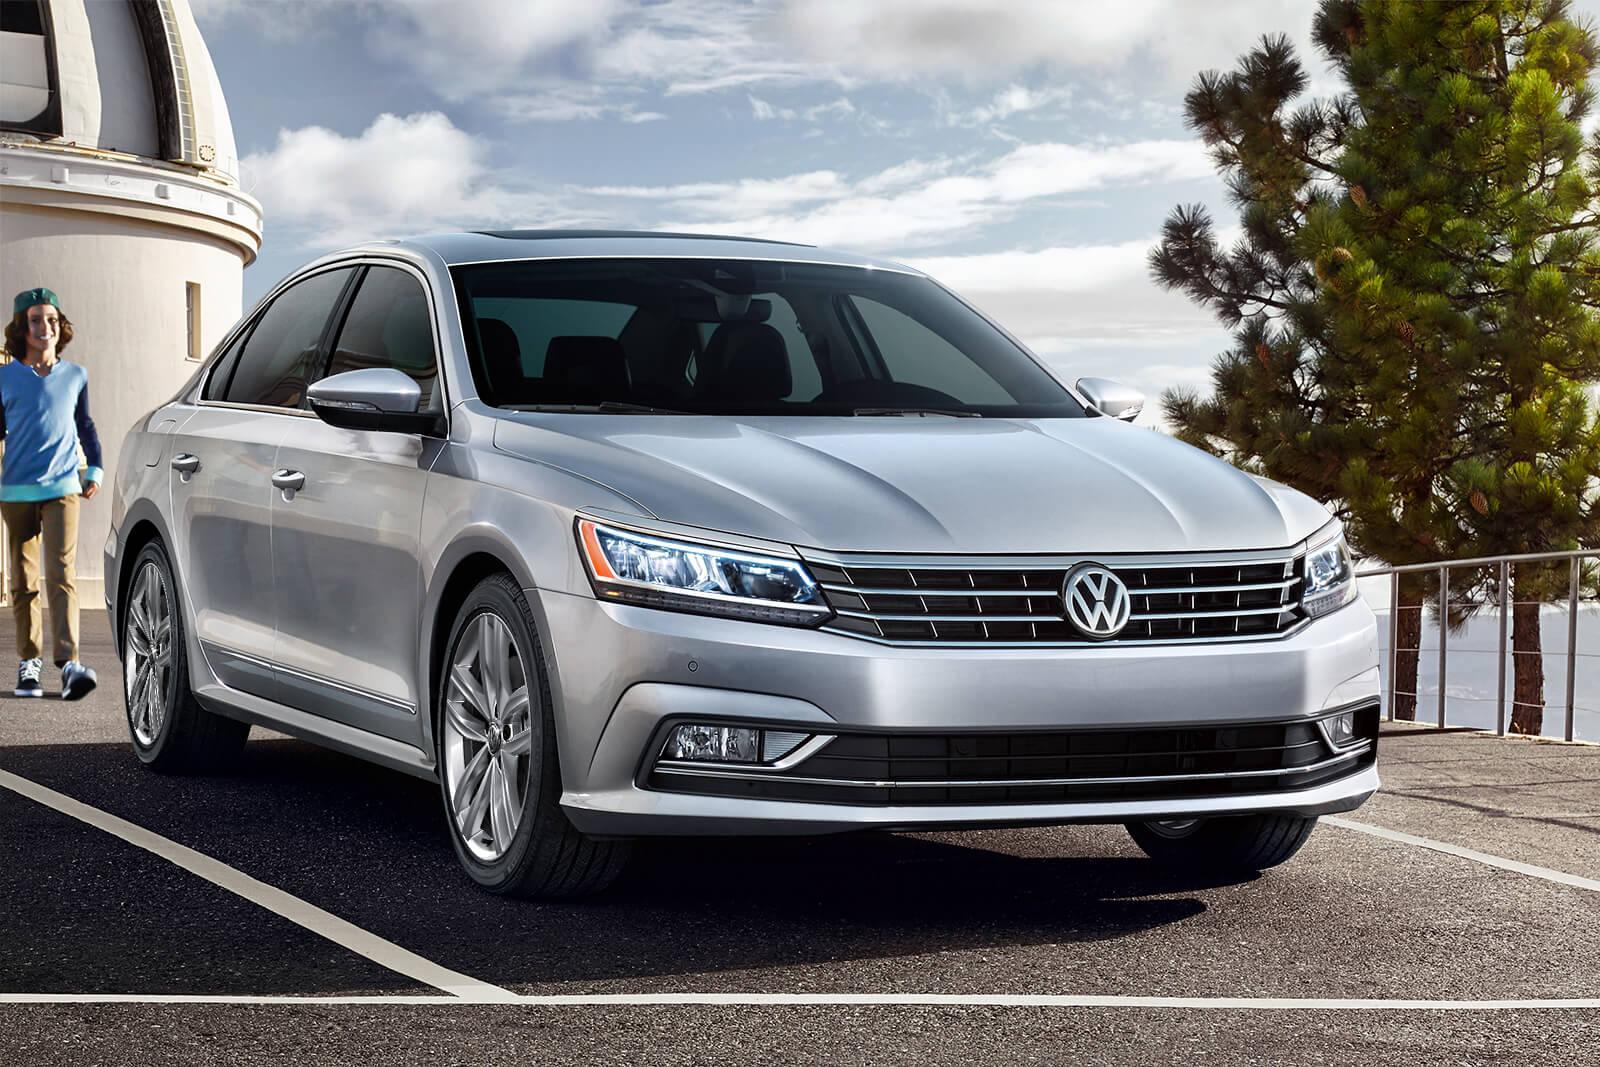 2019 Volkswagen Passat Leasing near Greenbelt, MD